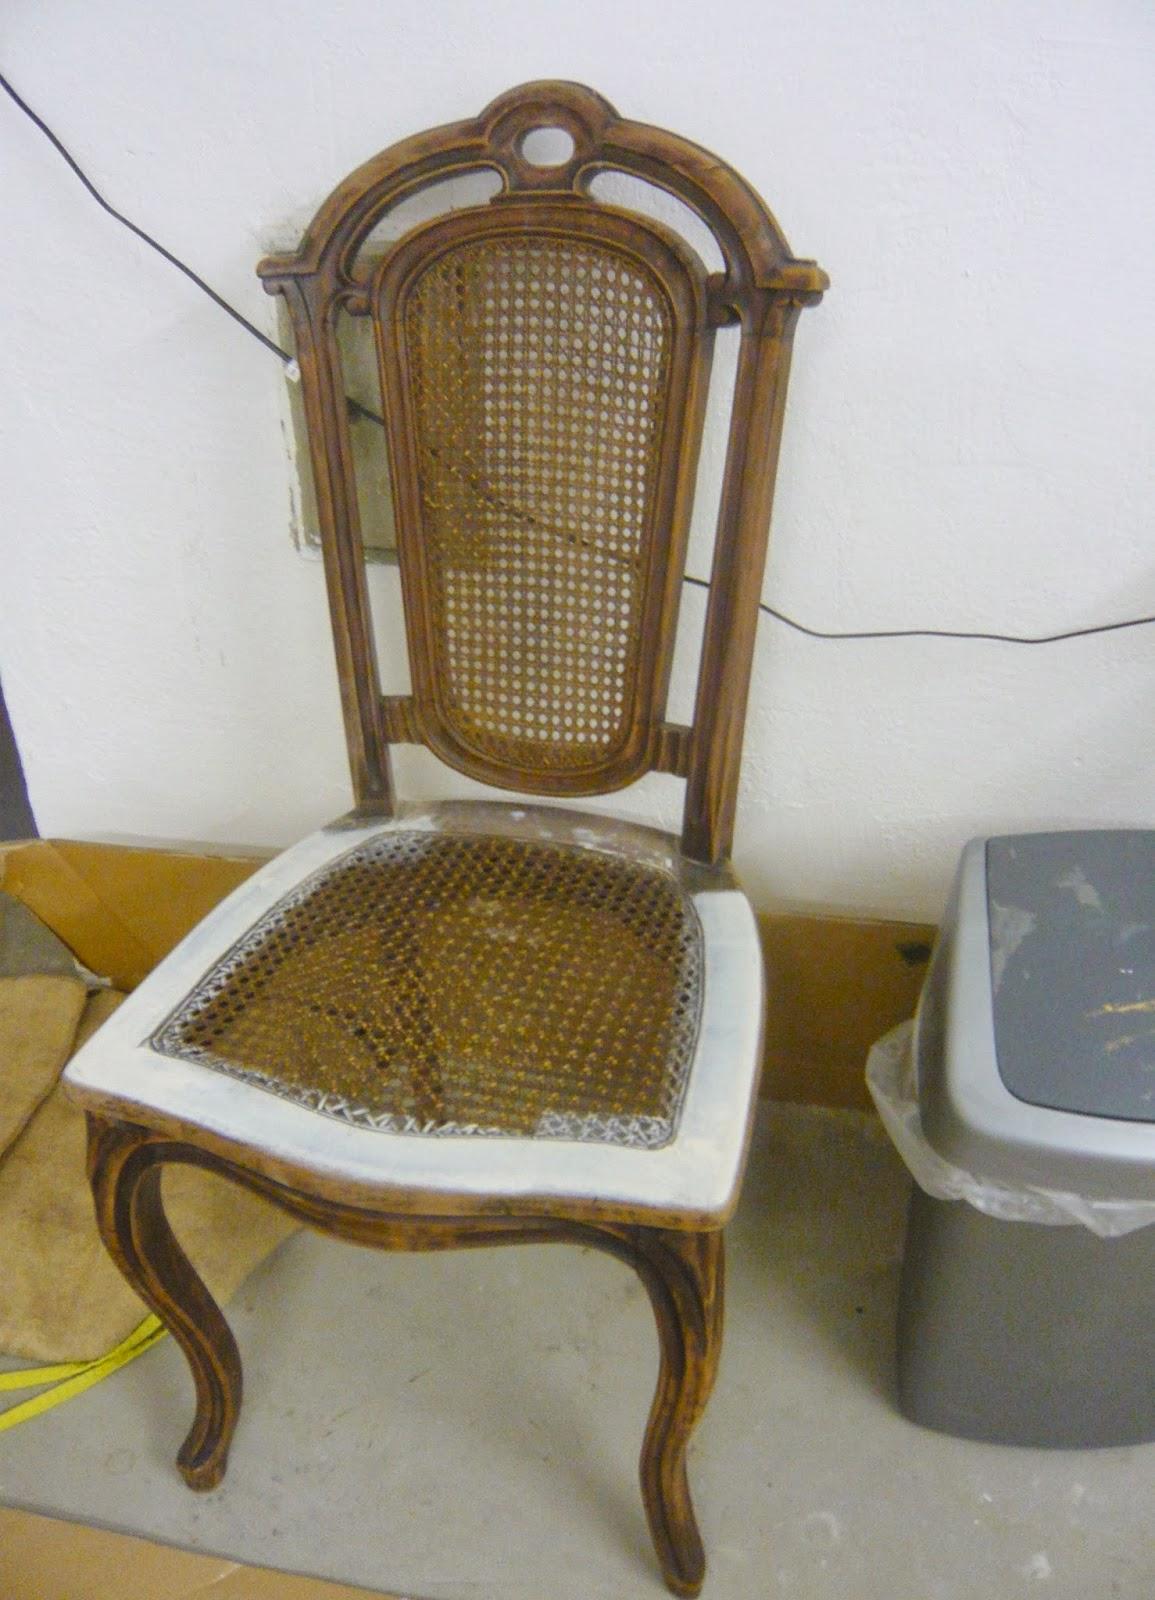 Fundstücke mit stil: alter stuhl im shabby look